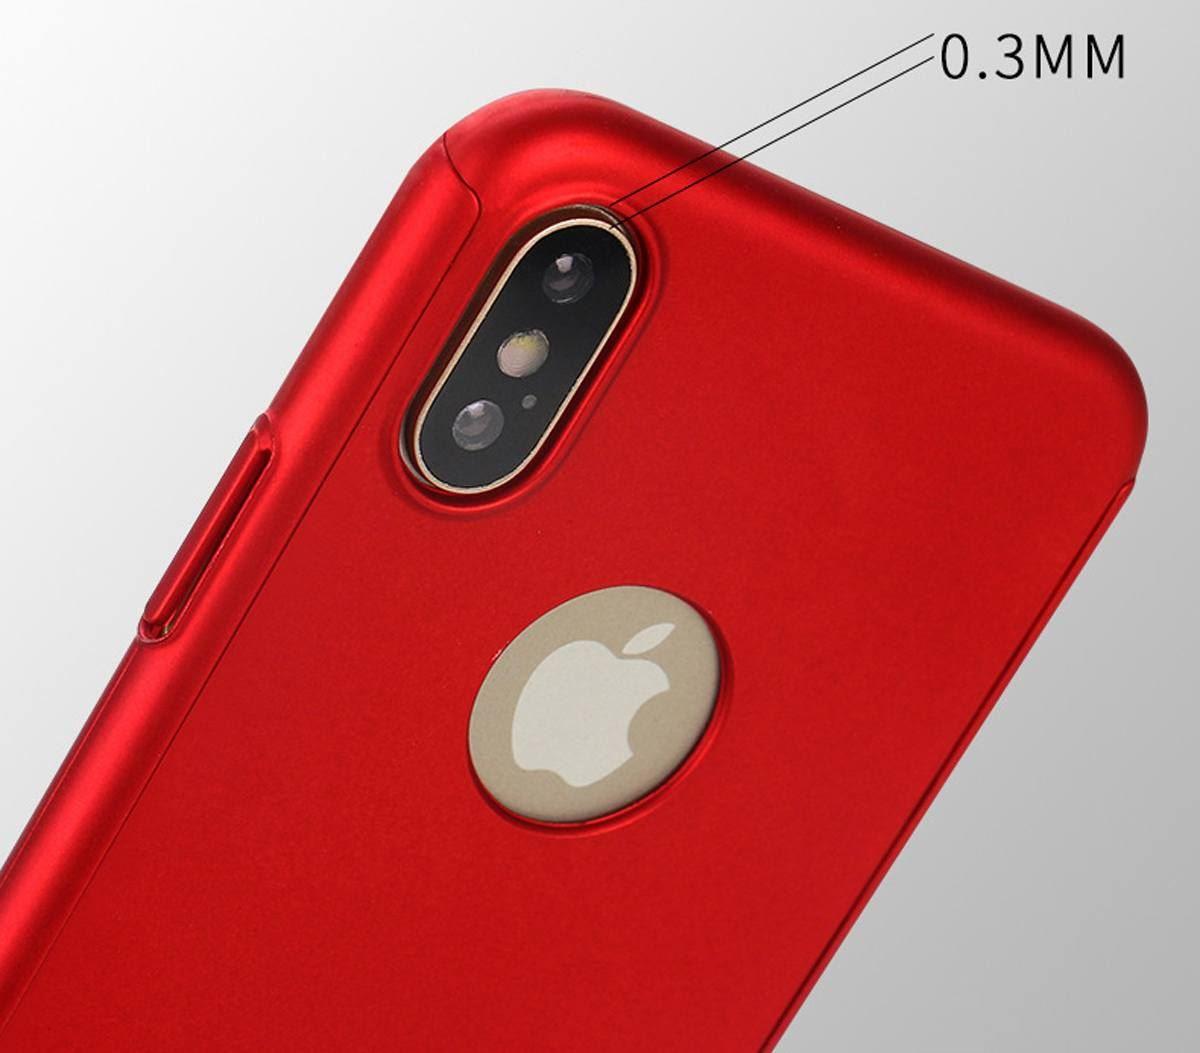 For-Apple-iPhone-XS-Max-XR-Hybrid-360-Slim-Ultra-Thin-Heavy-Duty-Shockproof-Case Indexbild 26